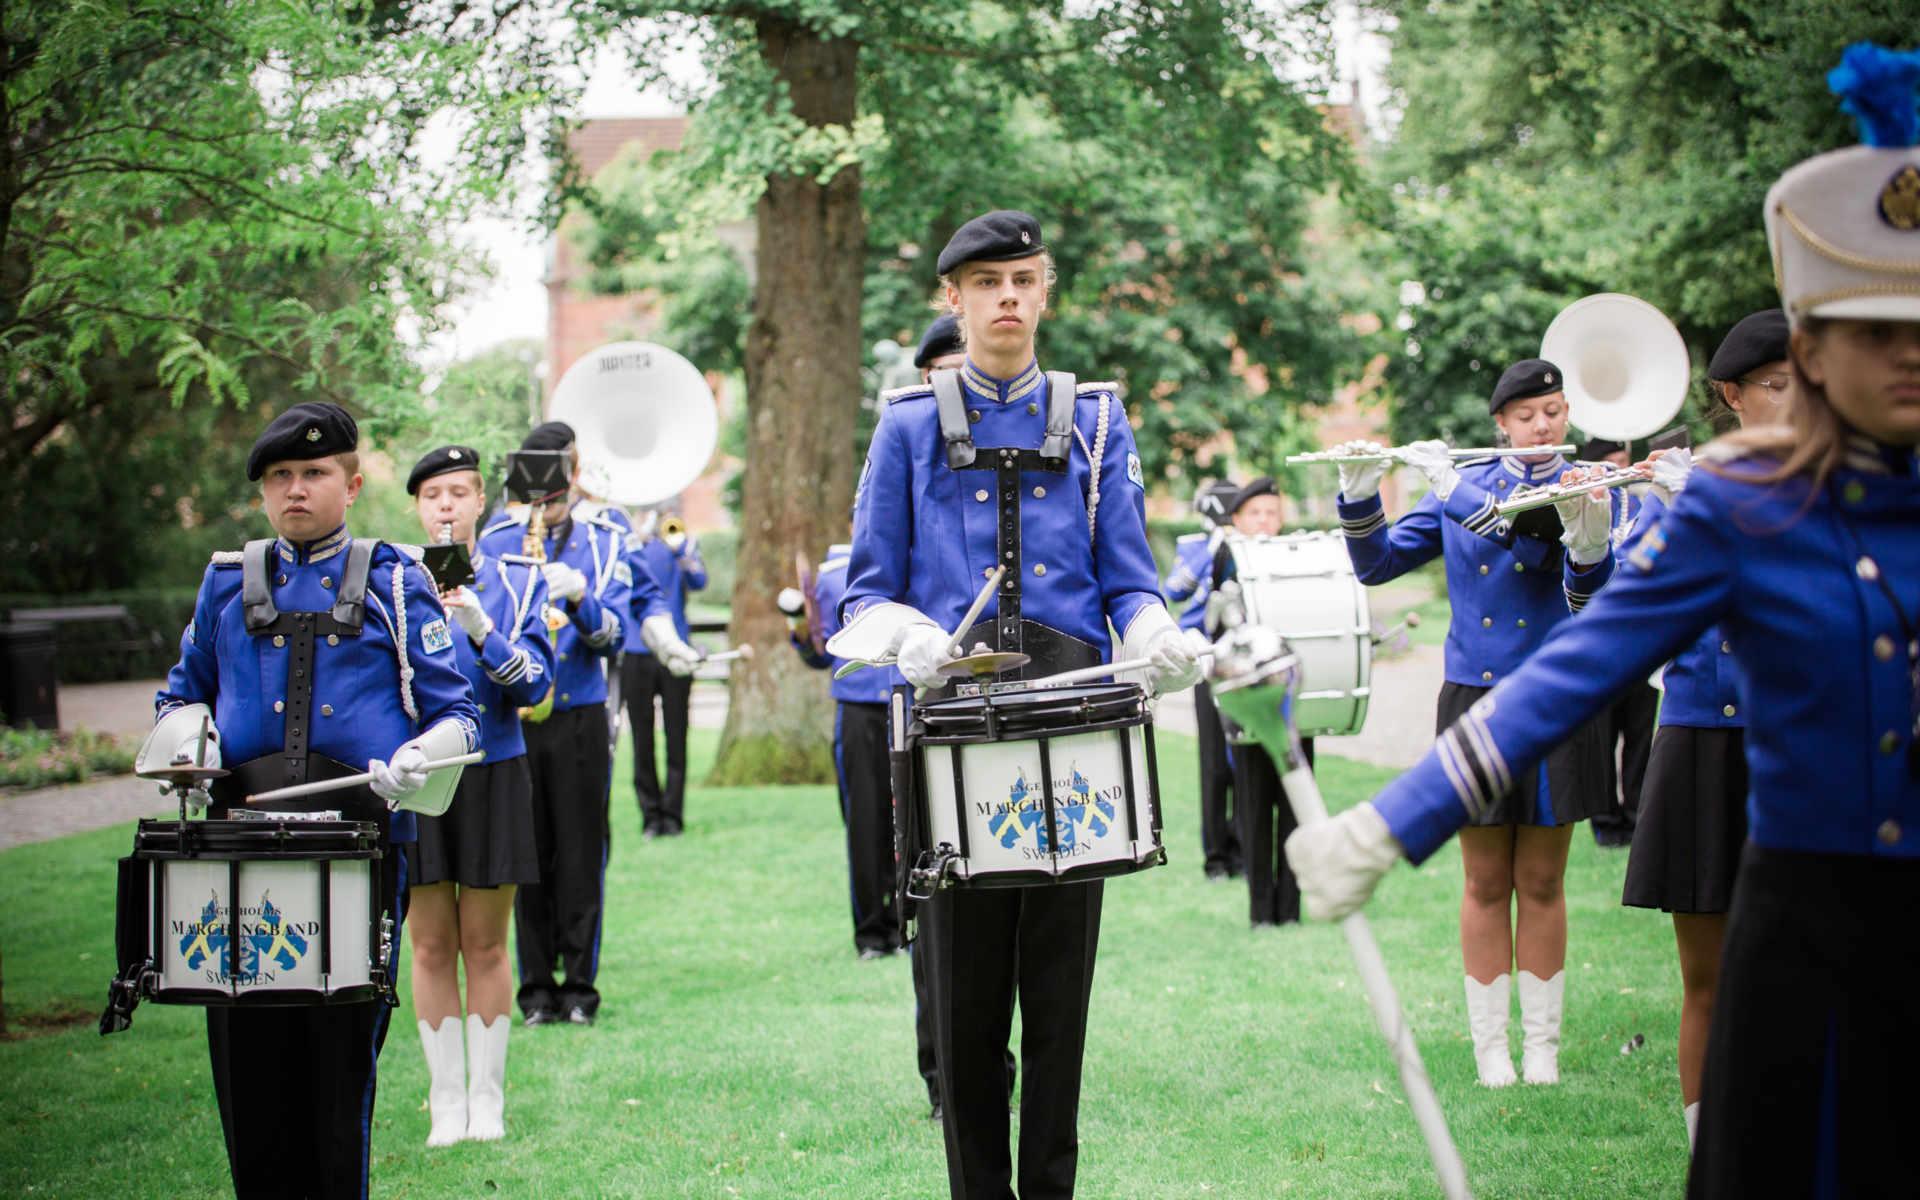 Ängelholms Marching Band